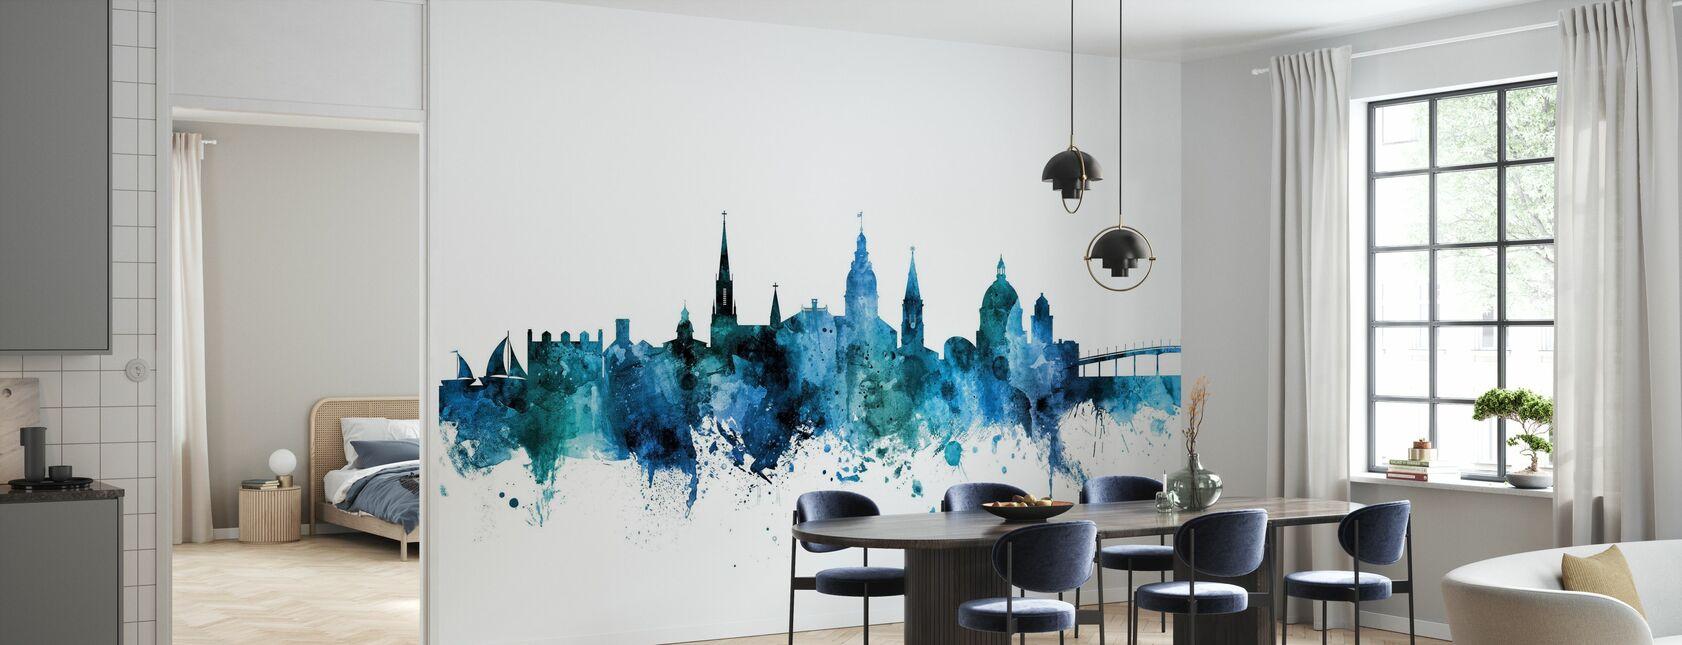 Annapolis Maryland Skyline - Wallpaper - Kitchen